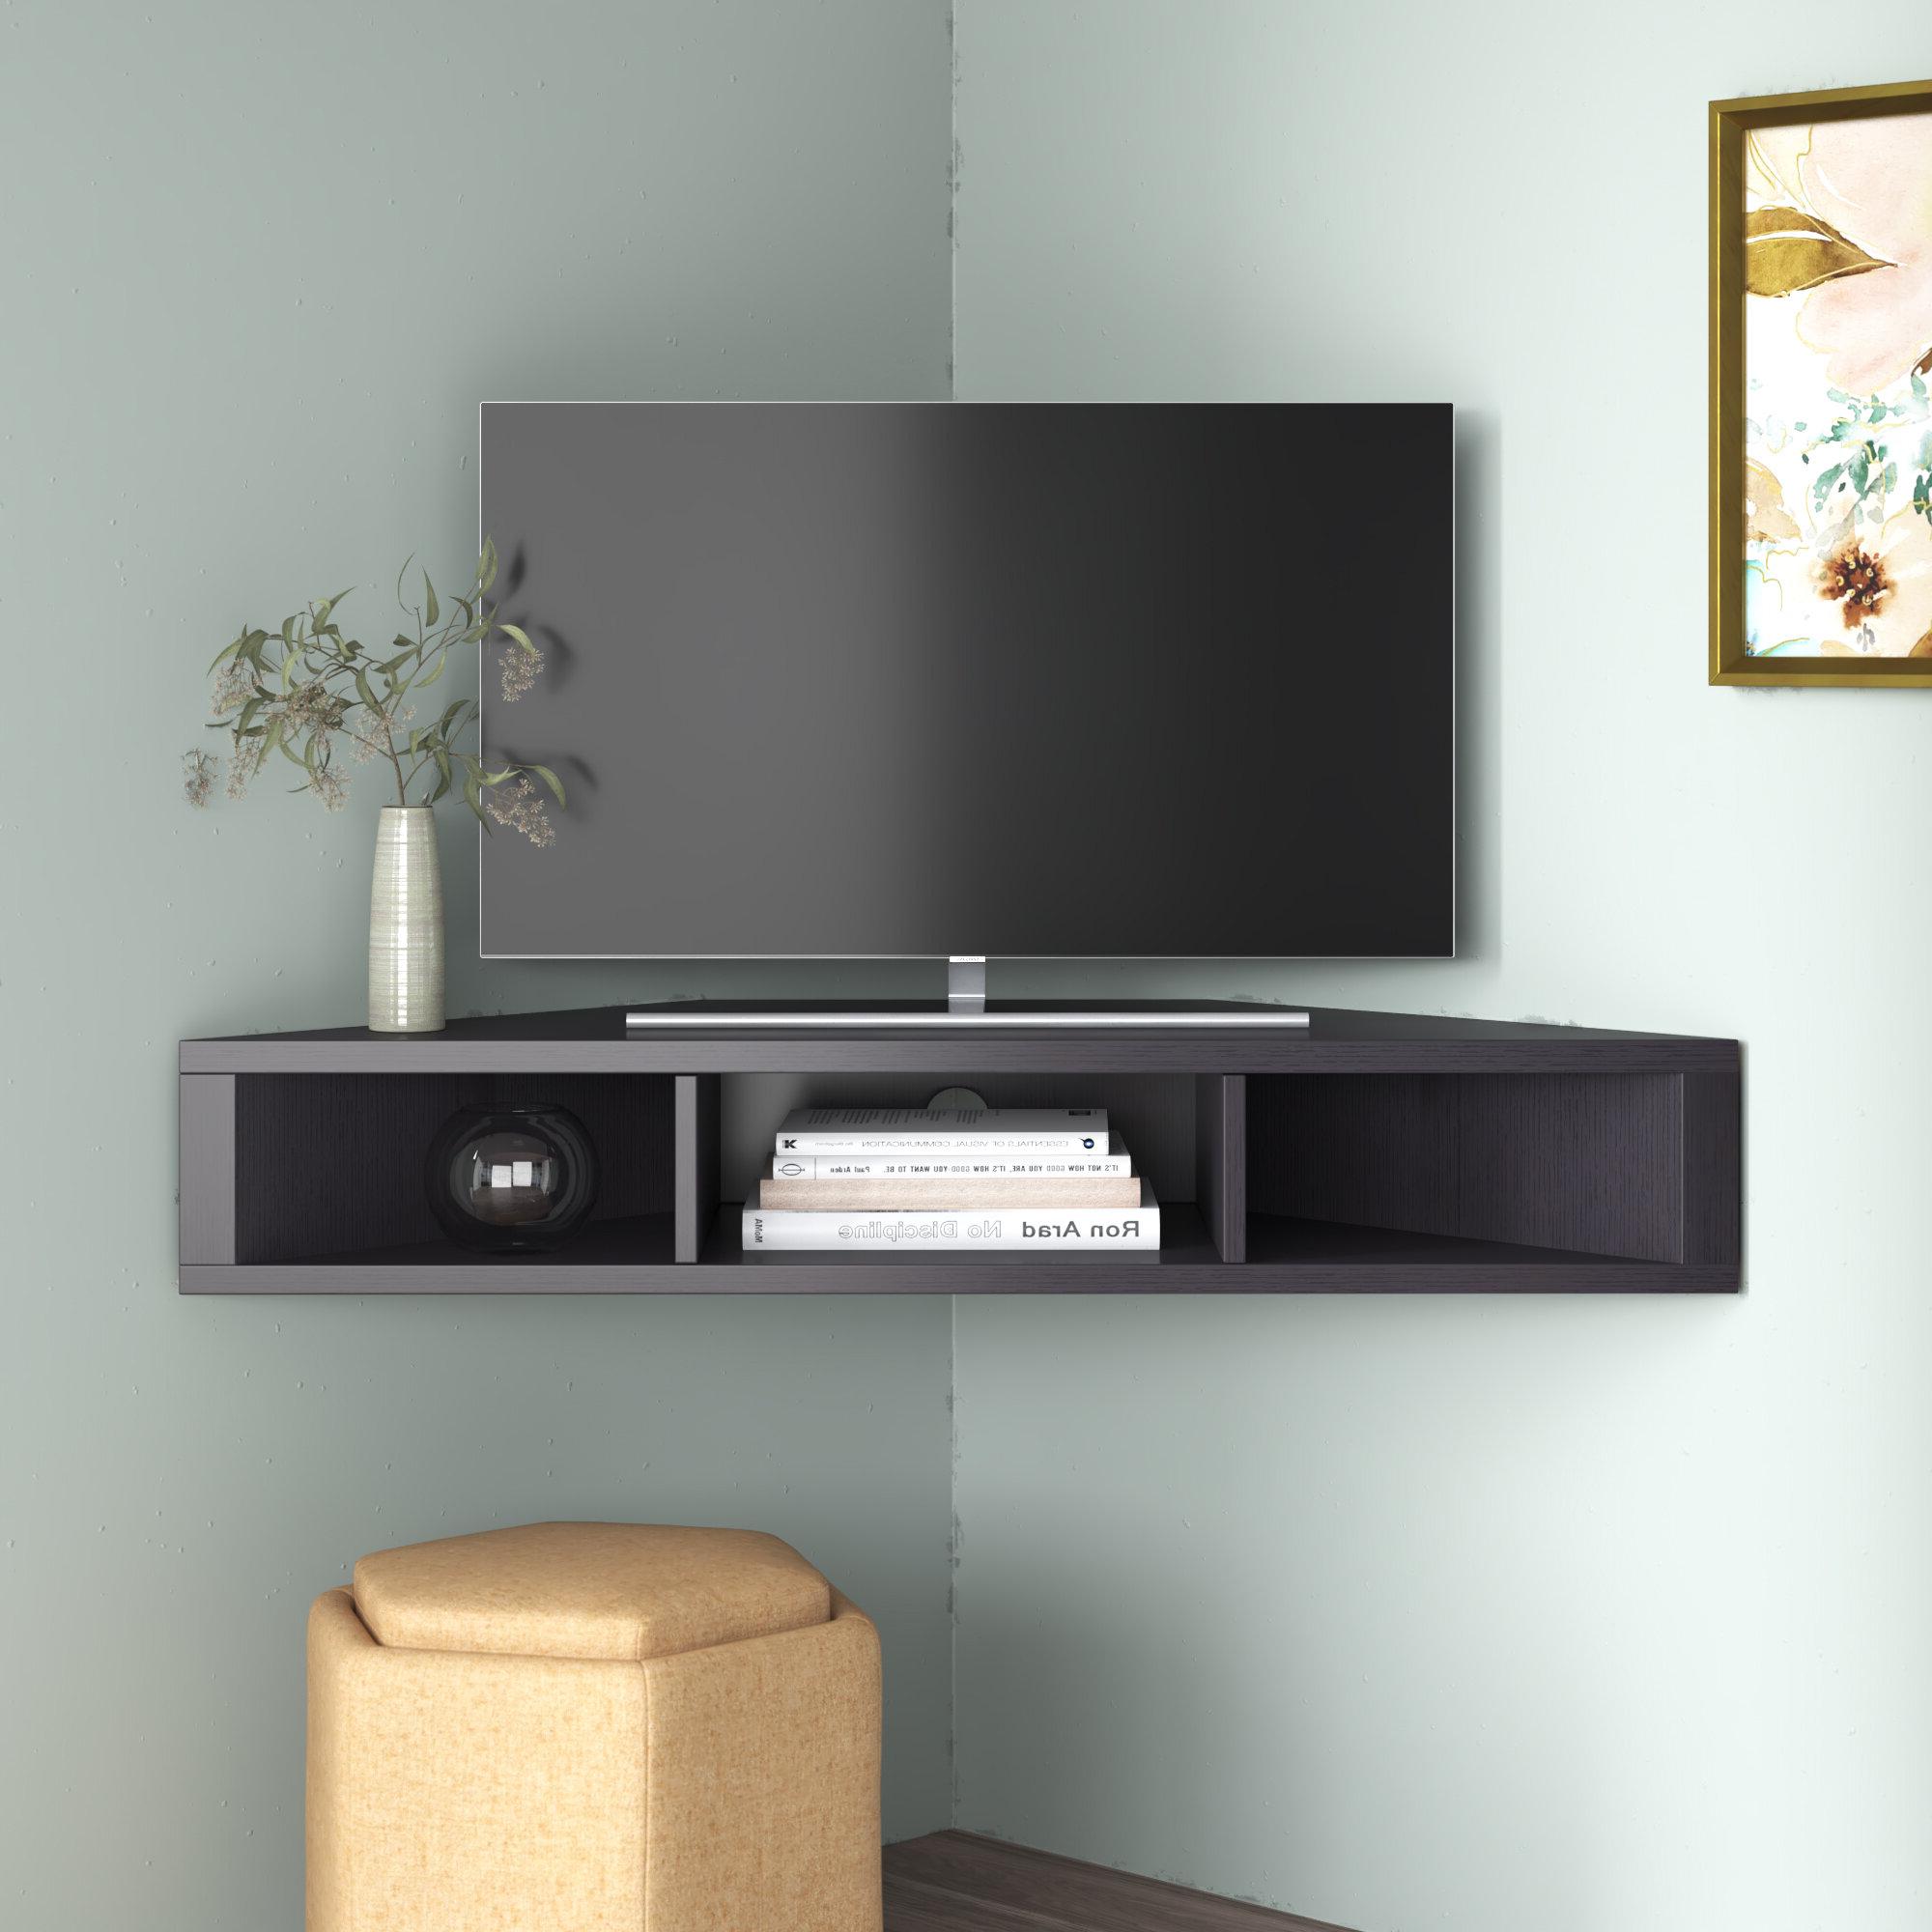 Most Recently Released Tv Stand Wall Mount Corner – Dierenambulanceverhalen Throughout Freya Corner Tv Stands (View 1 of 10)